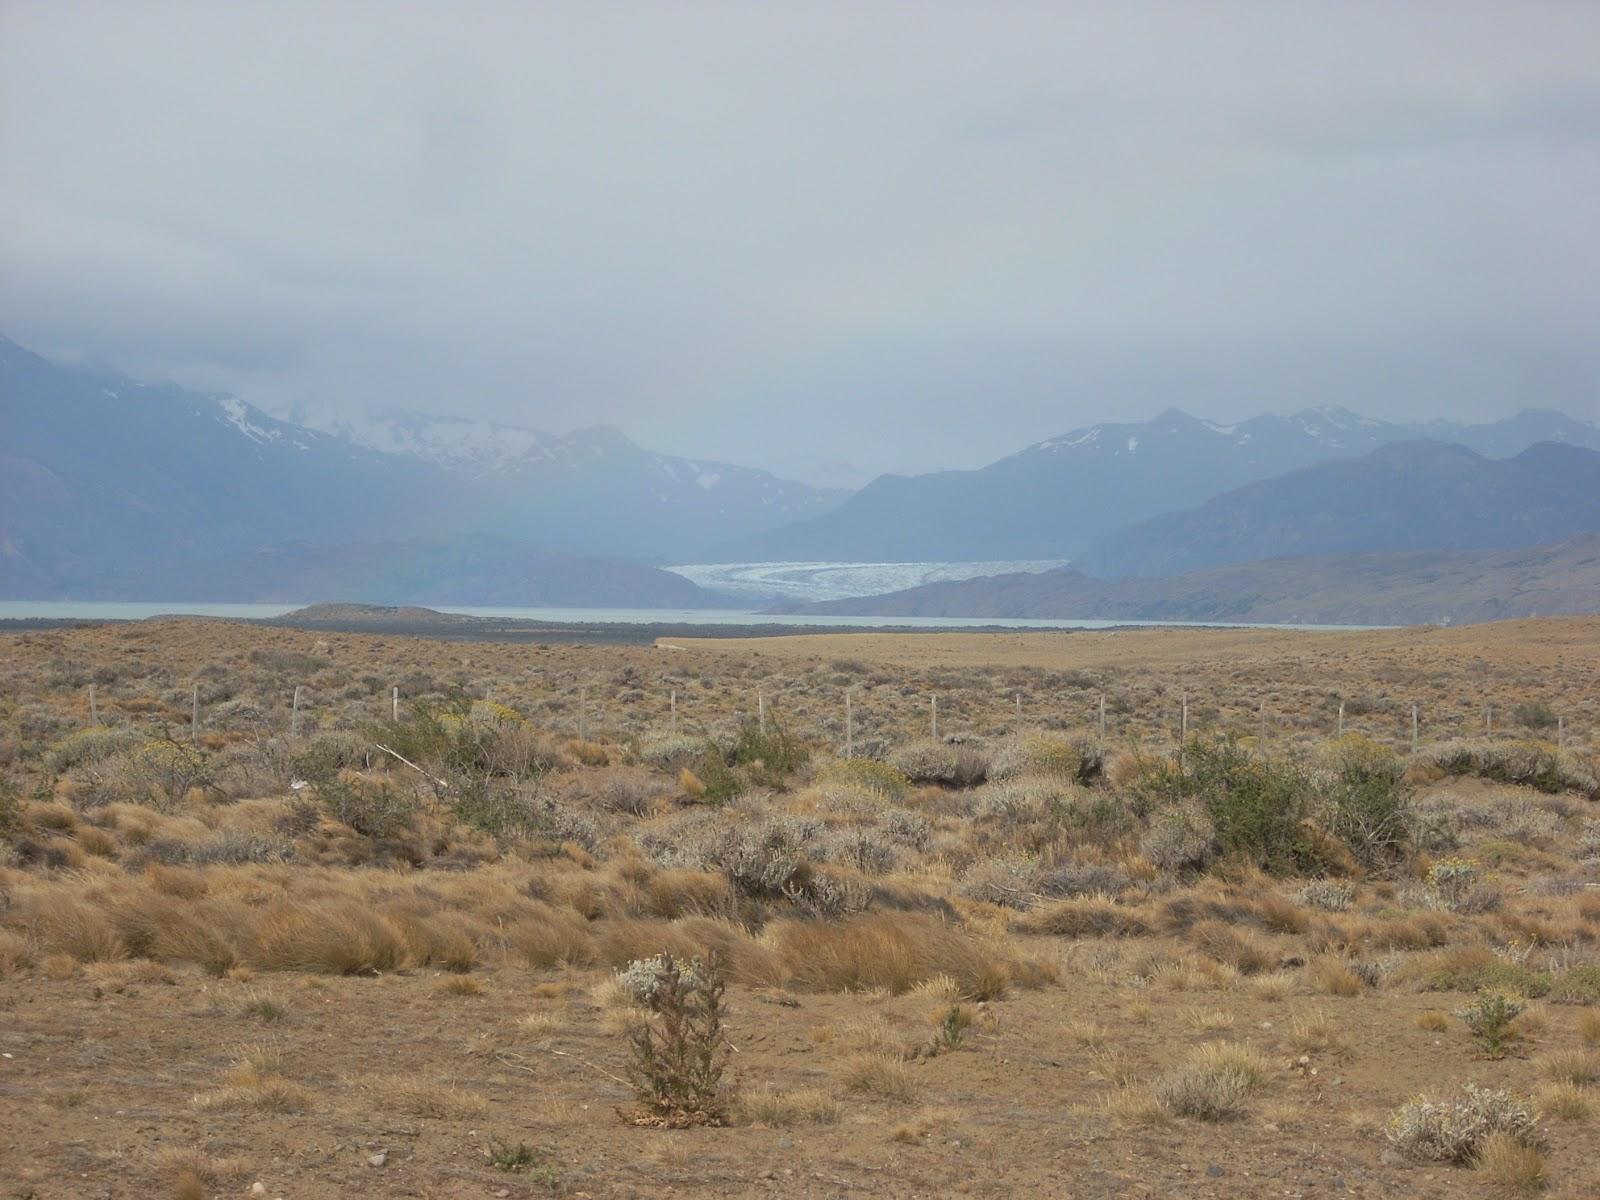 Glacier Viedma, feeding Lago Viedma